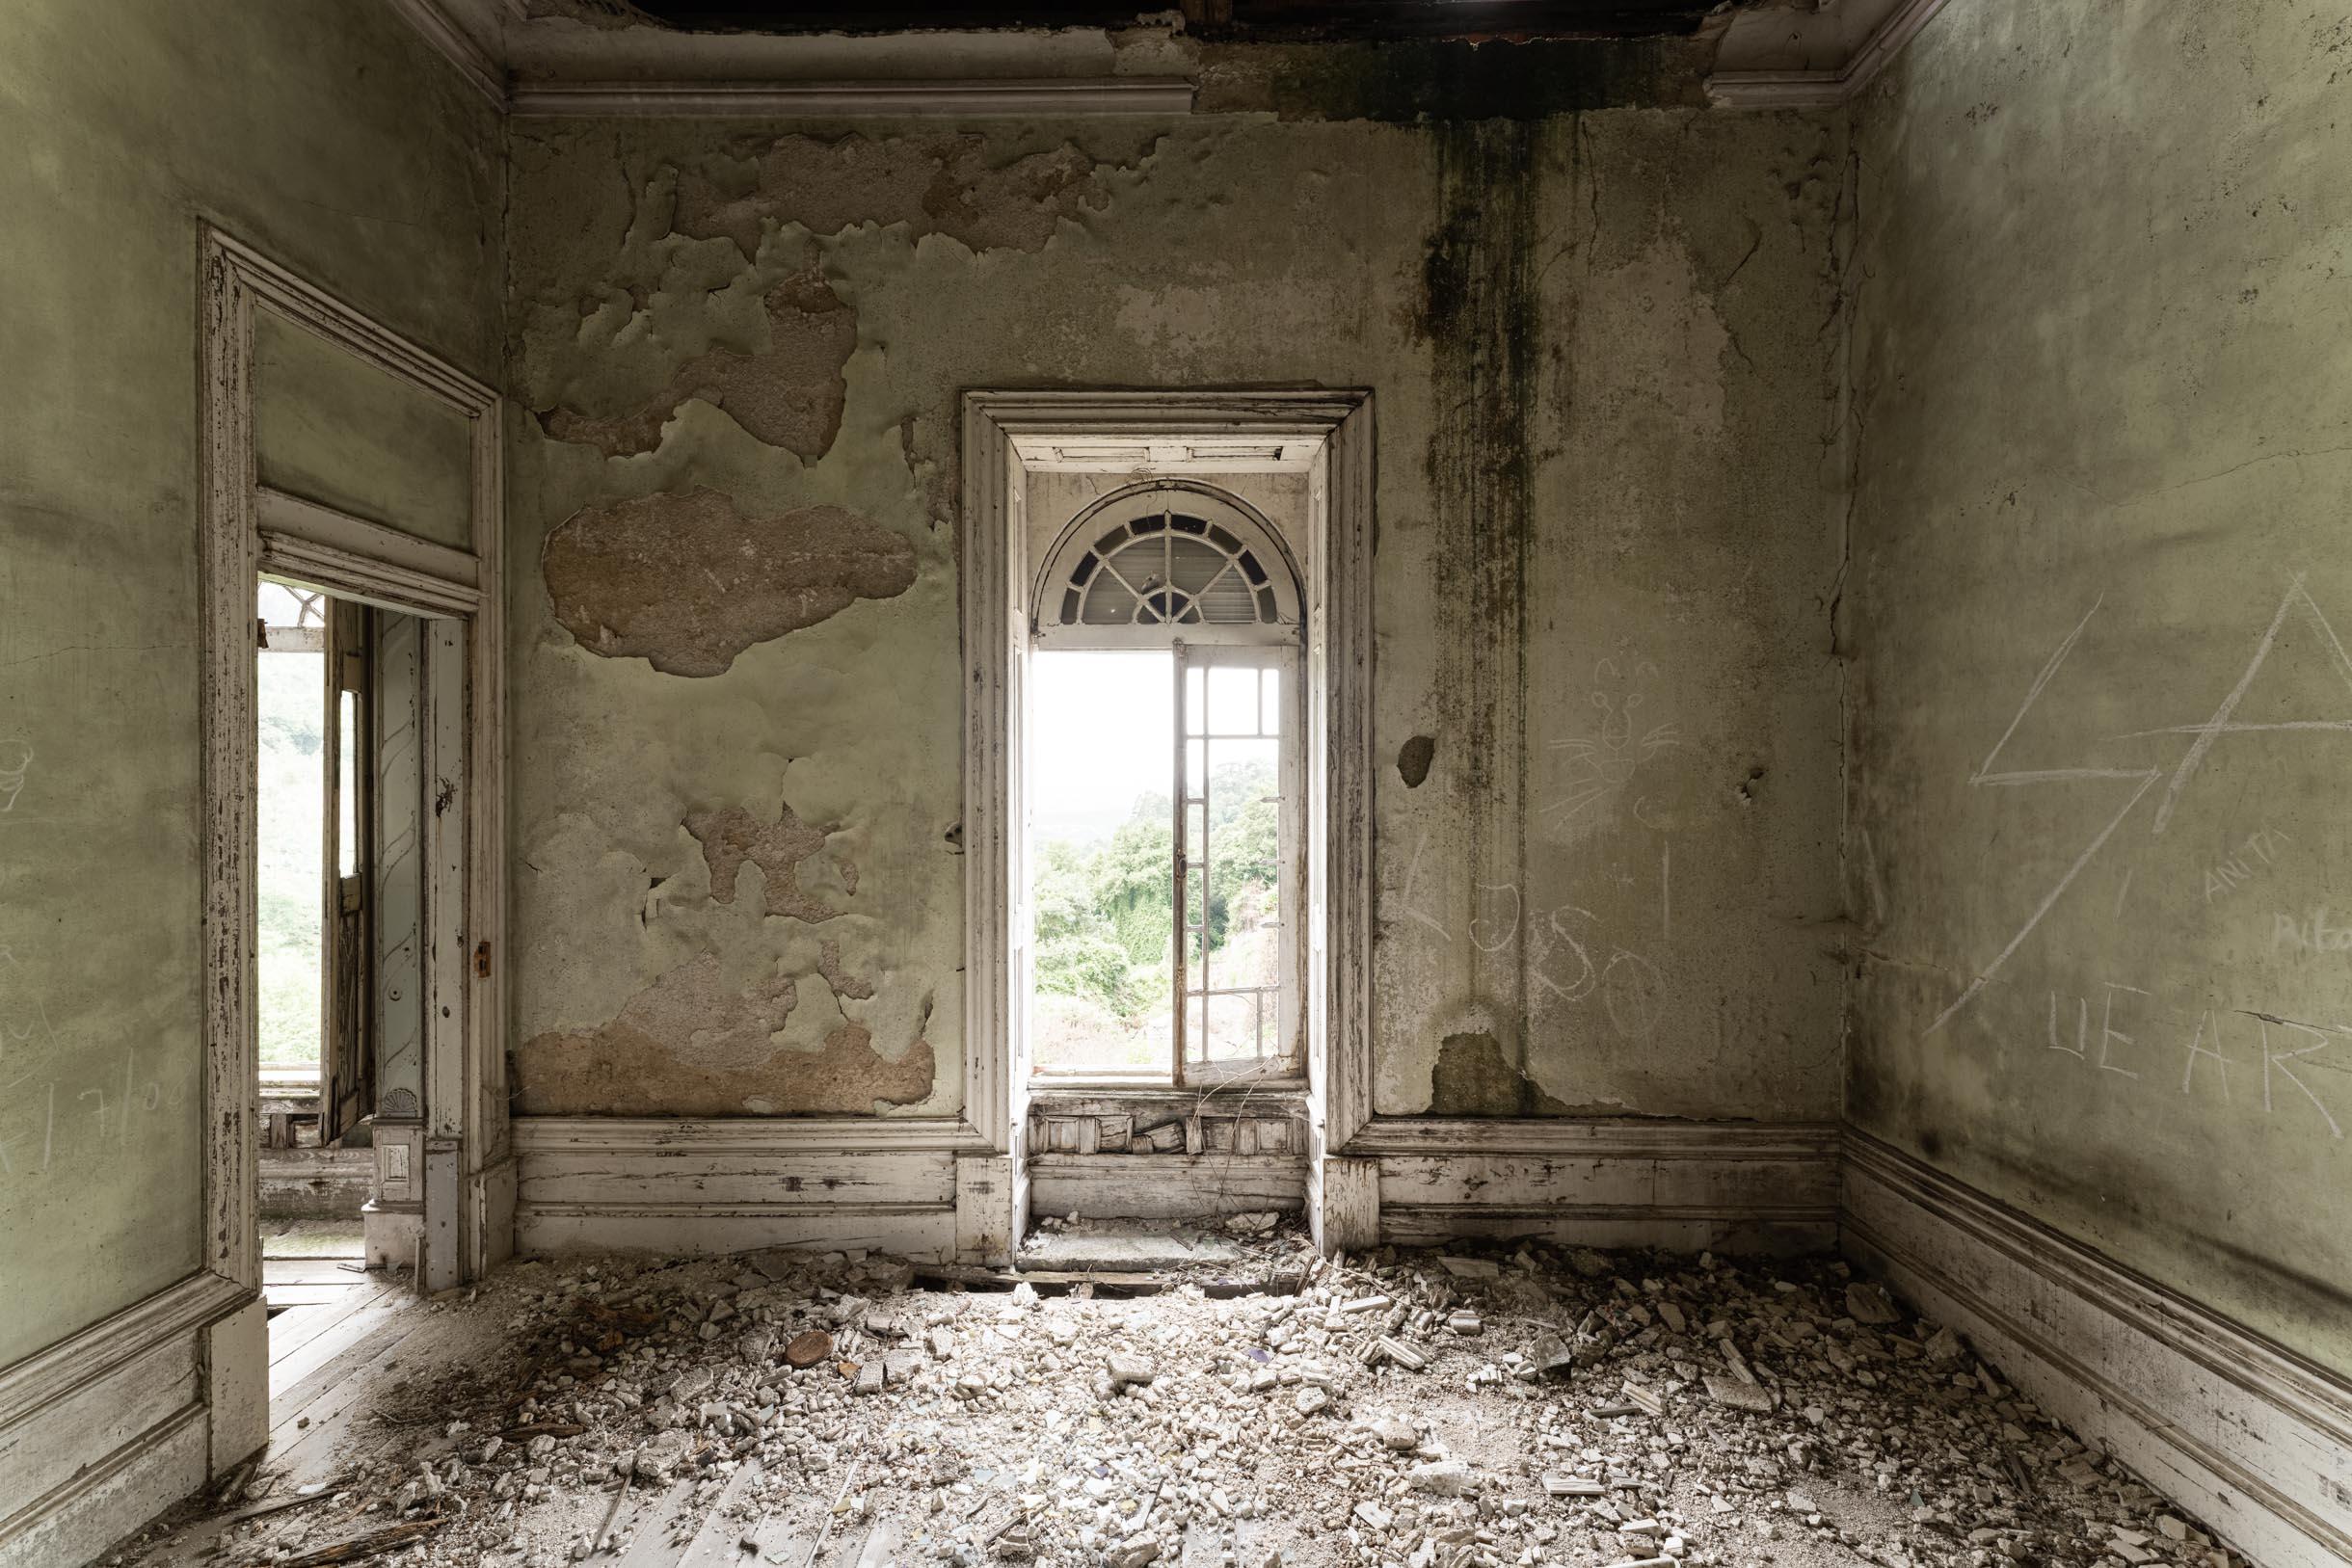 Dream Palace